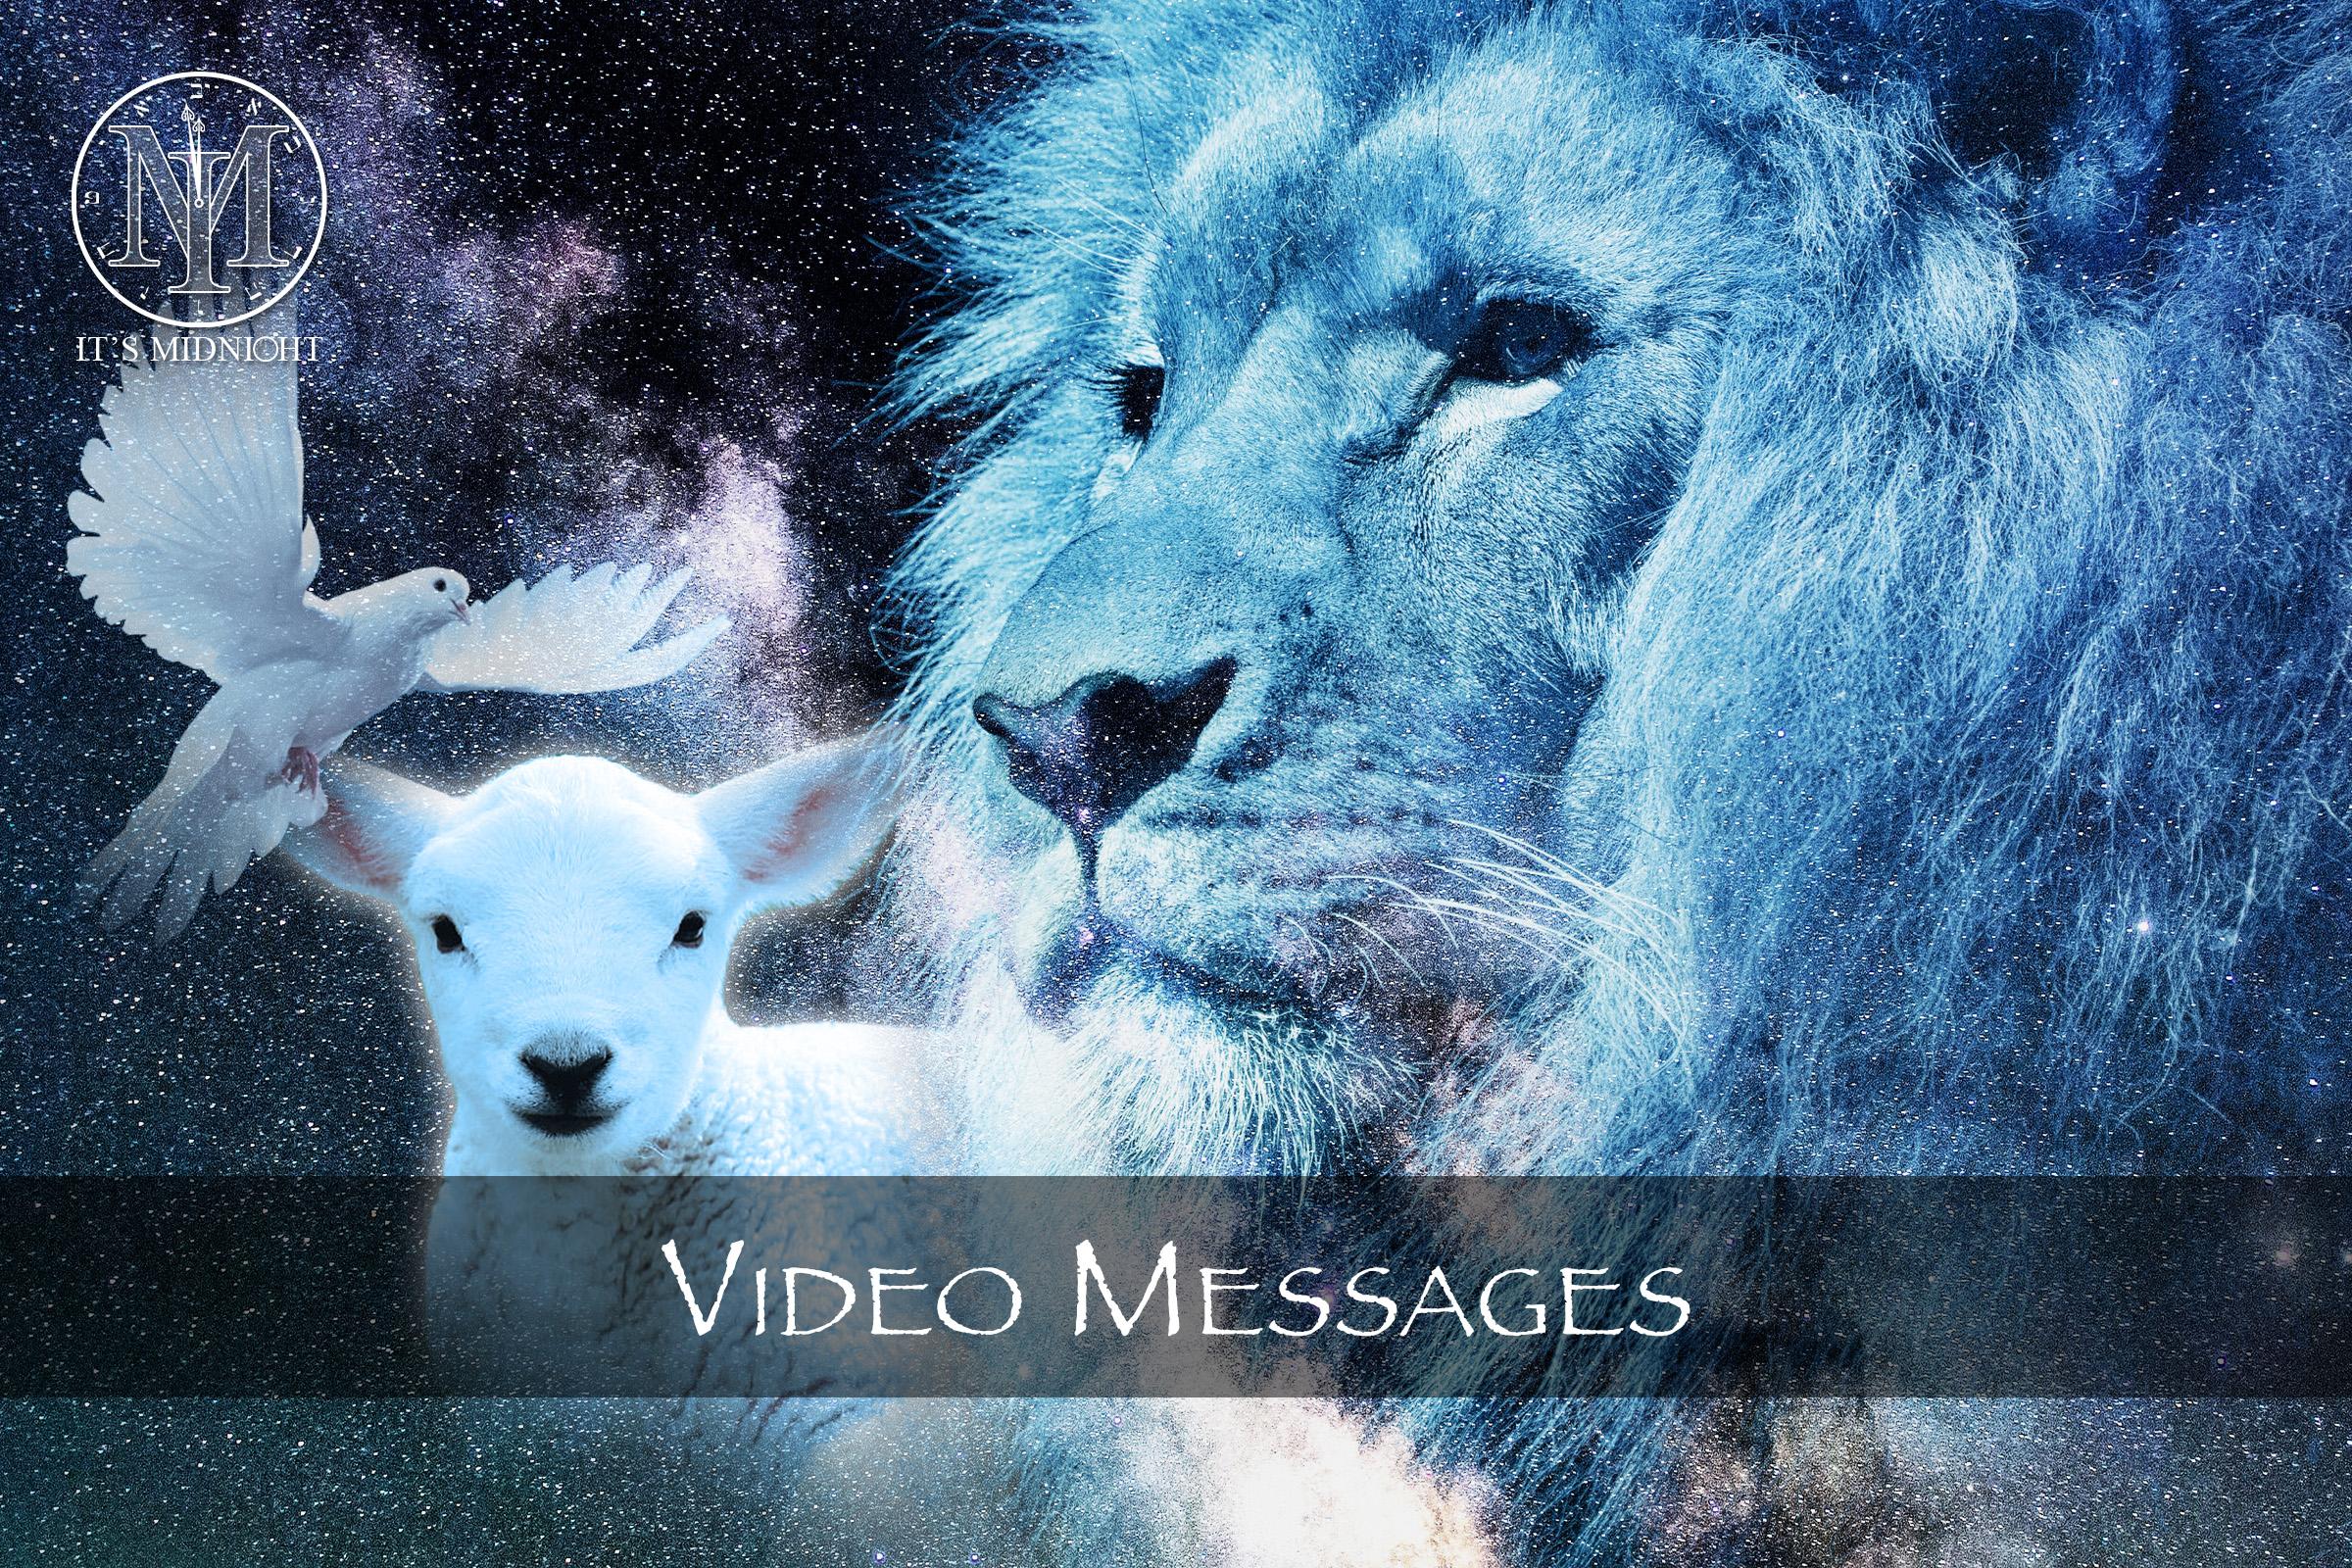 Video Messages - Thumbnail.jpg